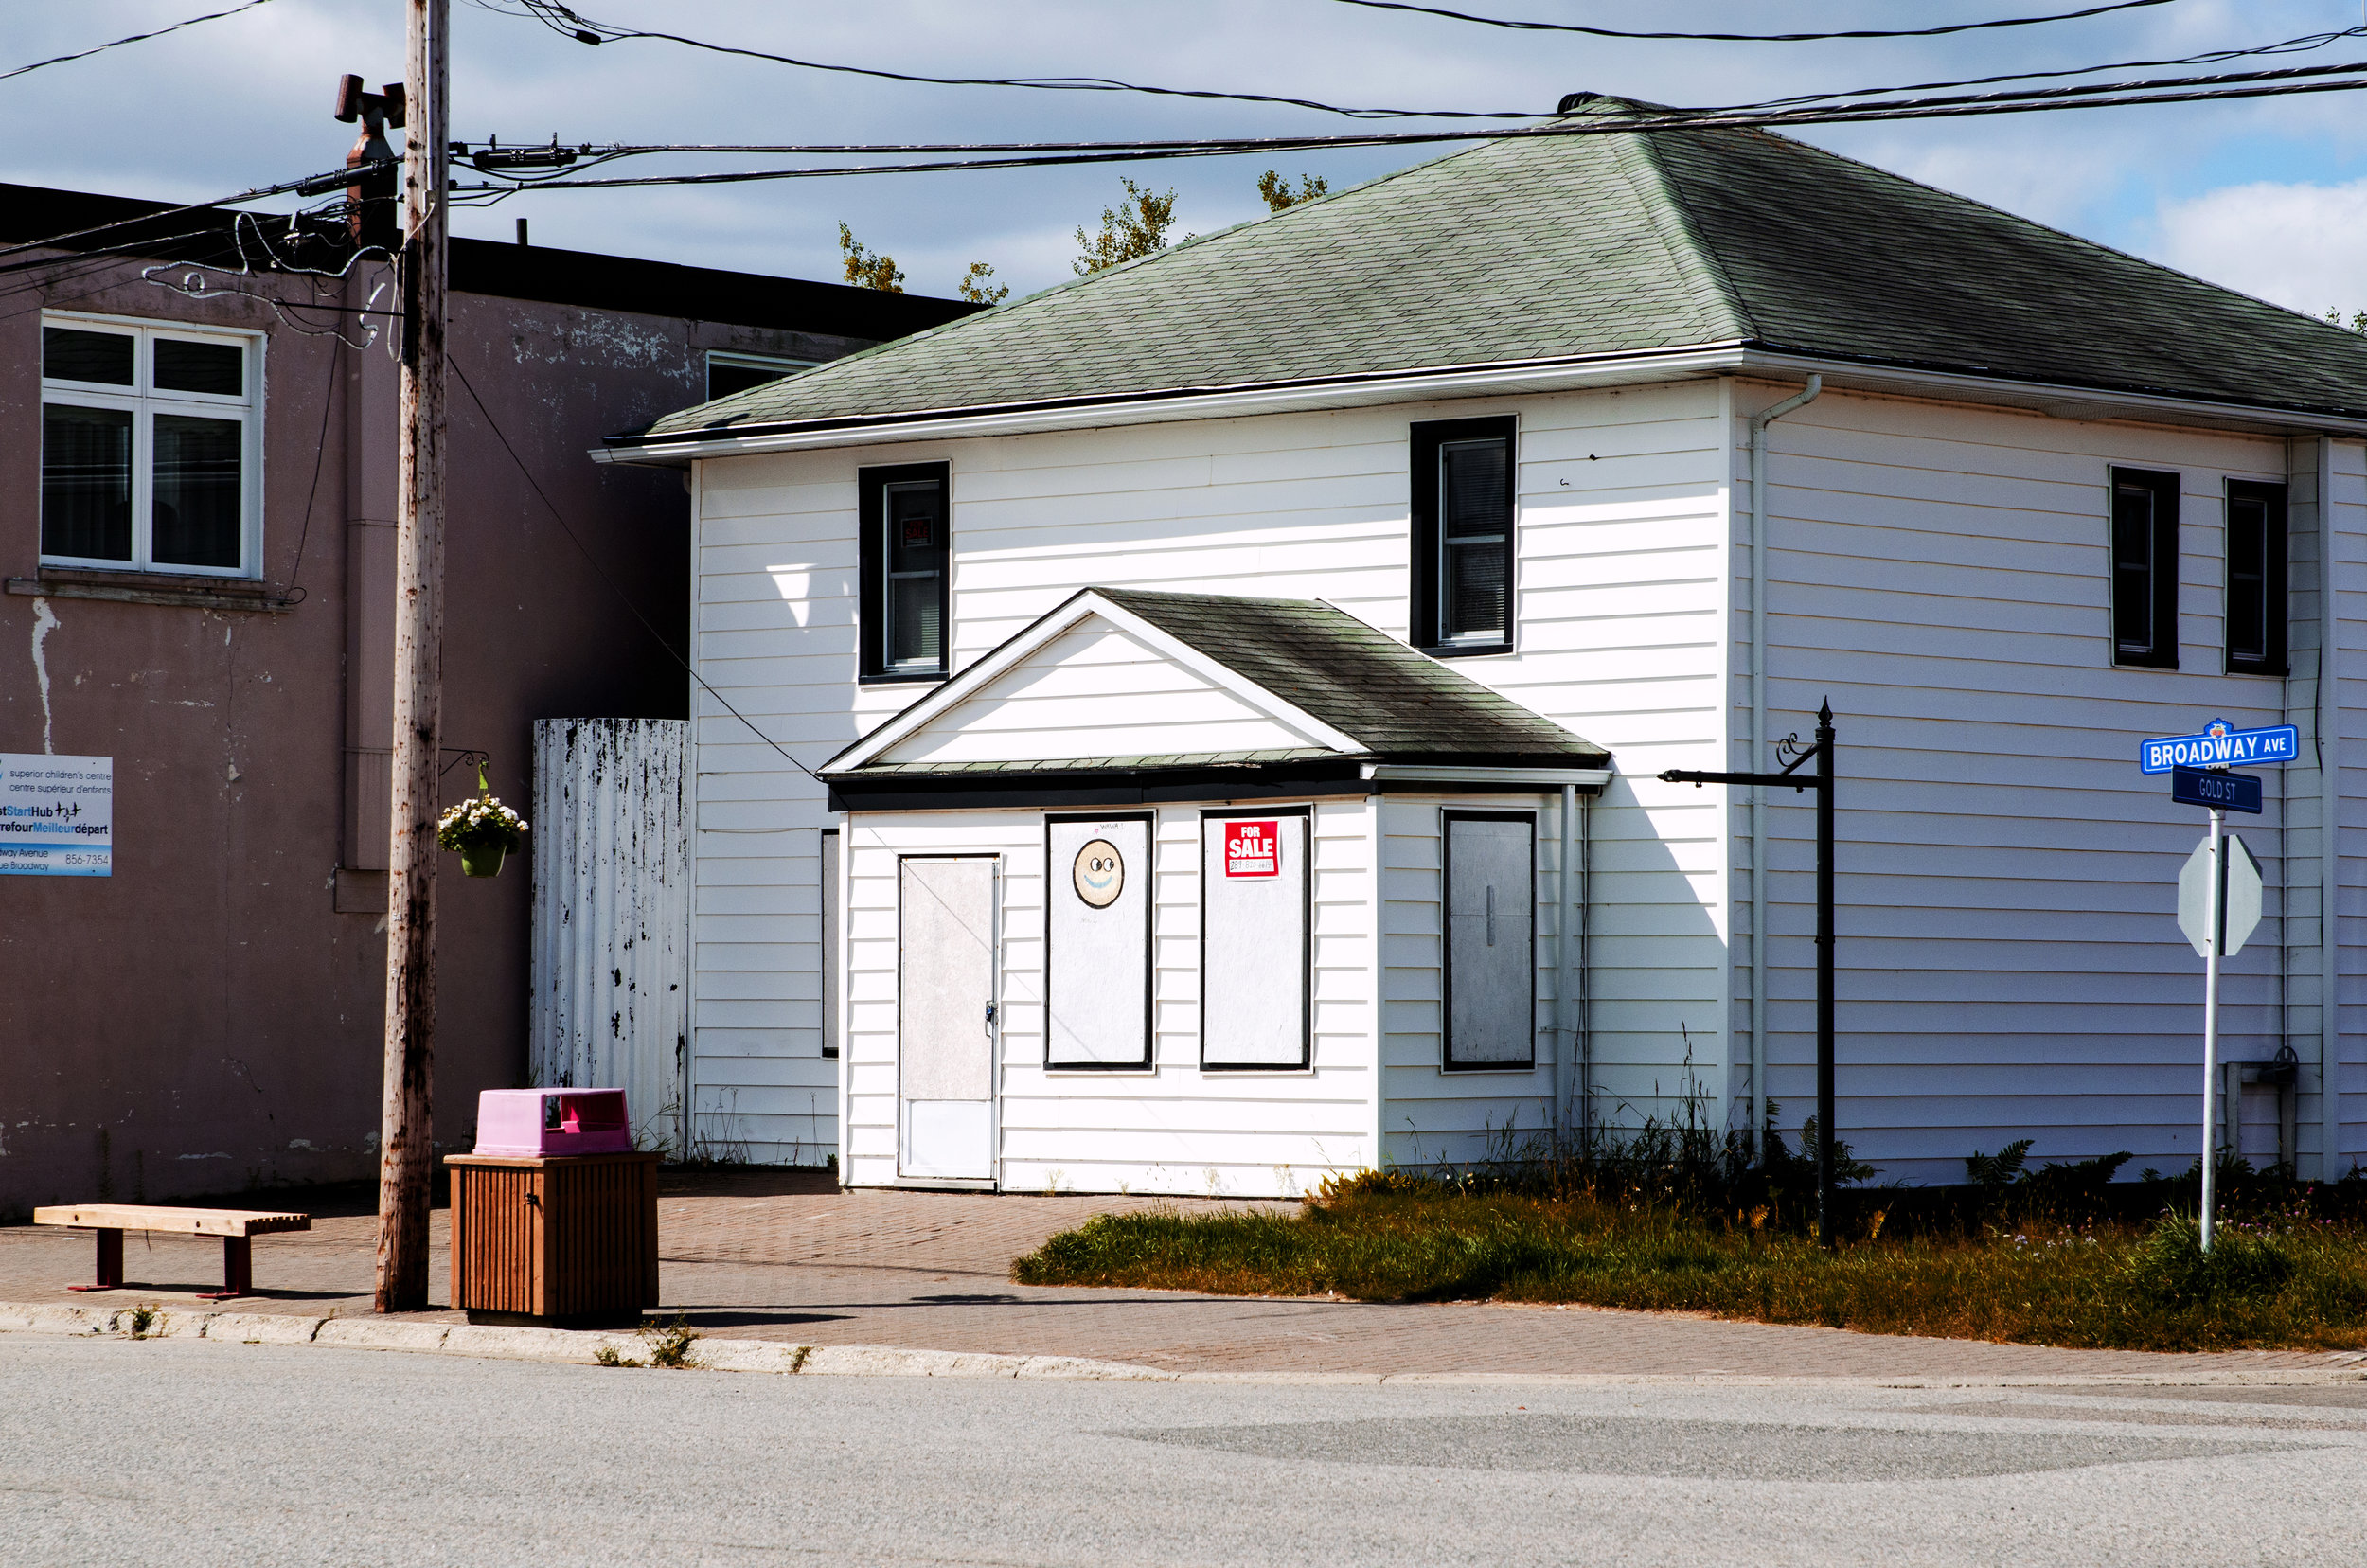 Jenkins, Cheyenne. Green House. 2017. Digital Photography. Wawa, Ontario